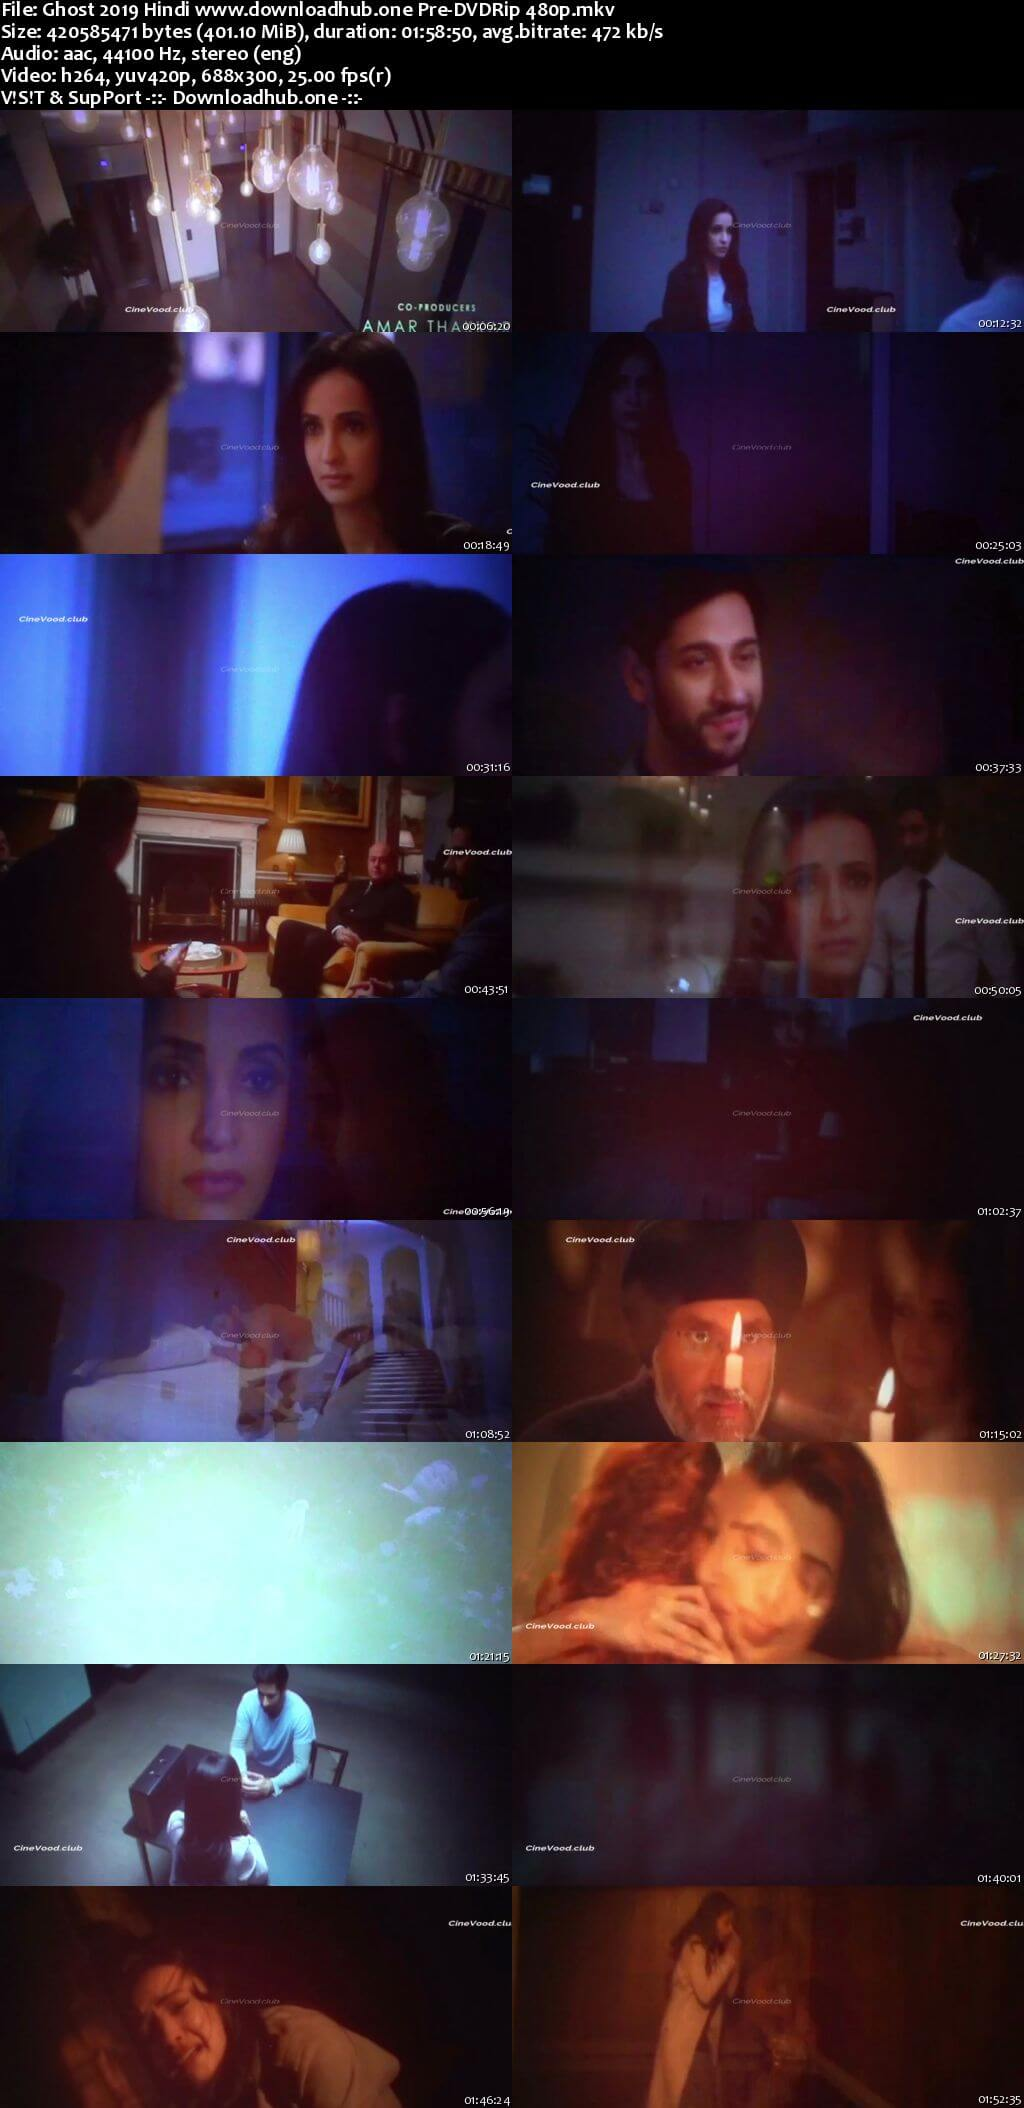 Ghost 2019 Hindi 400MB Pre-DVDRip 480p